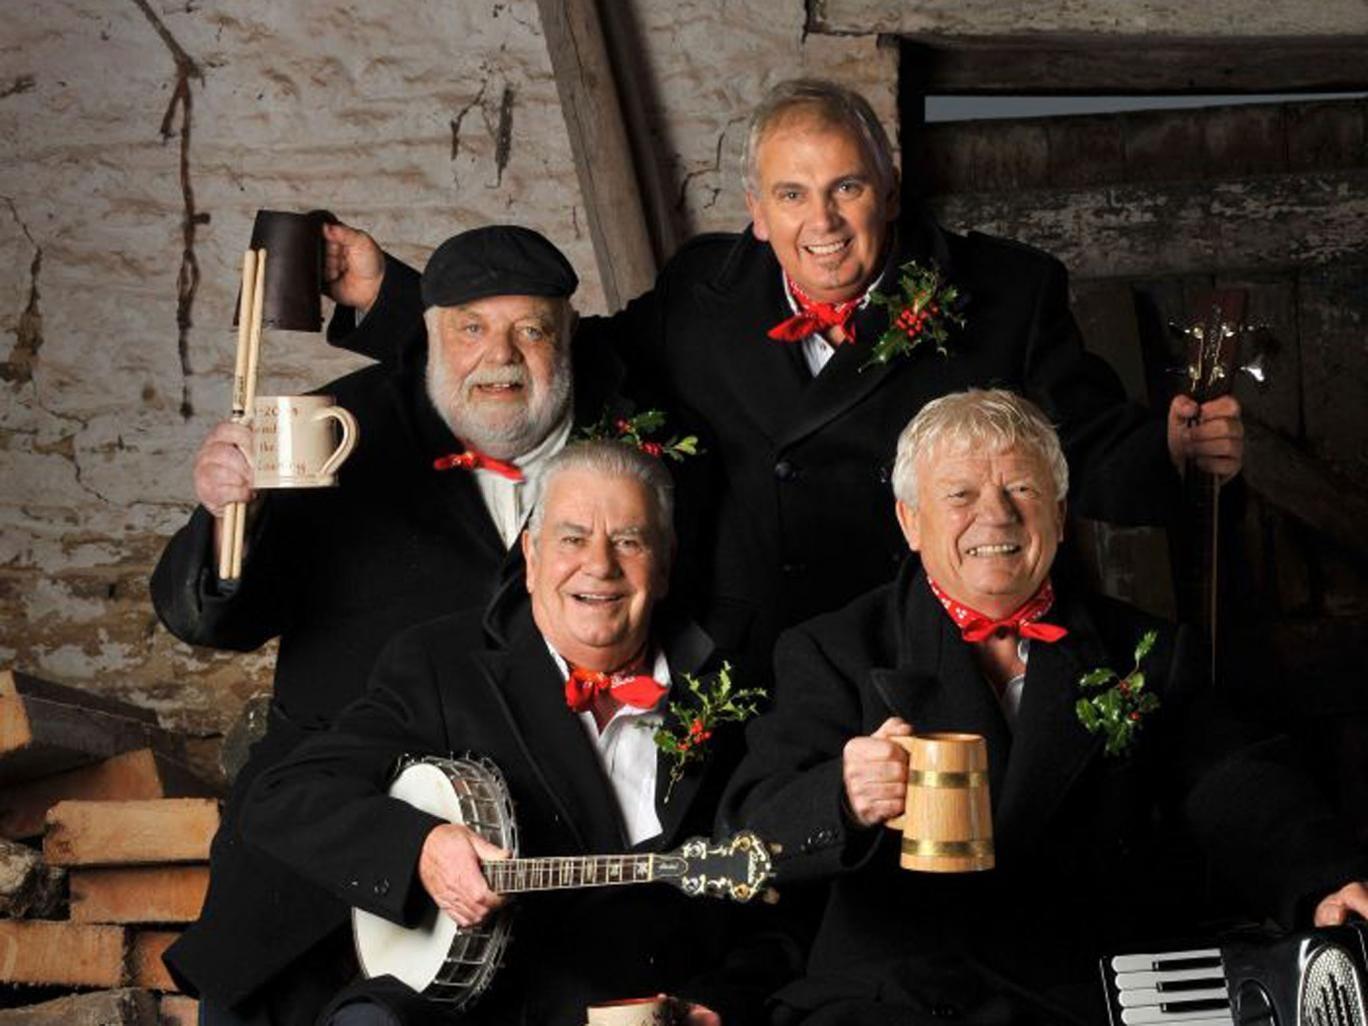 The Wurzels, folk quartet